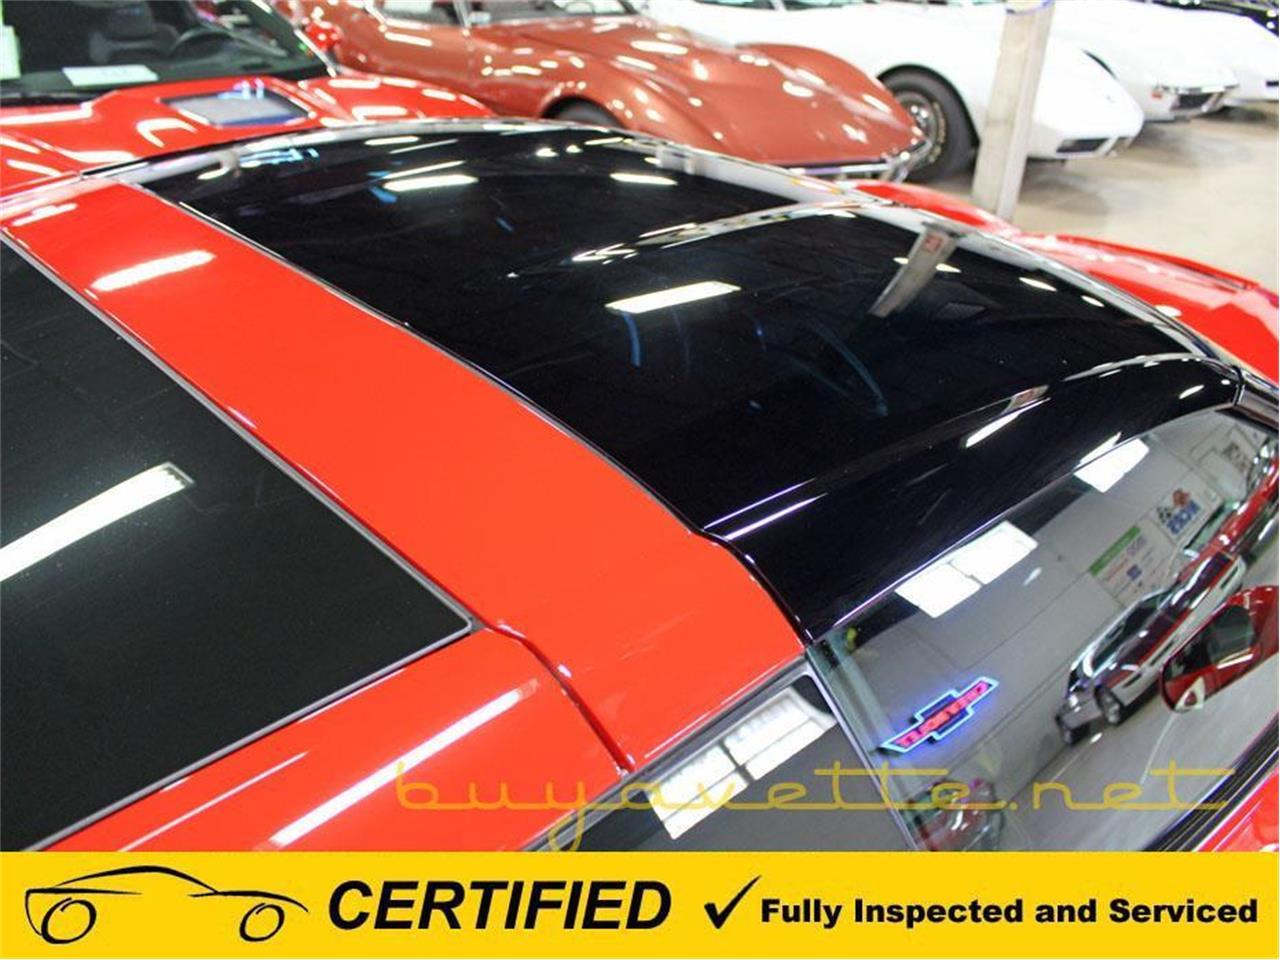 2019 Chevrolet Corvette (CC-1389240) for sale in Atlanta, Georgia